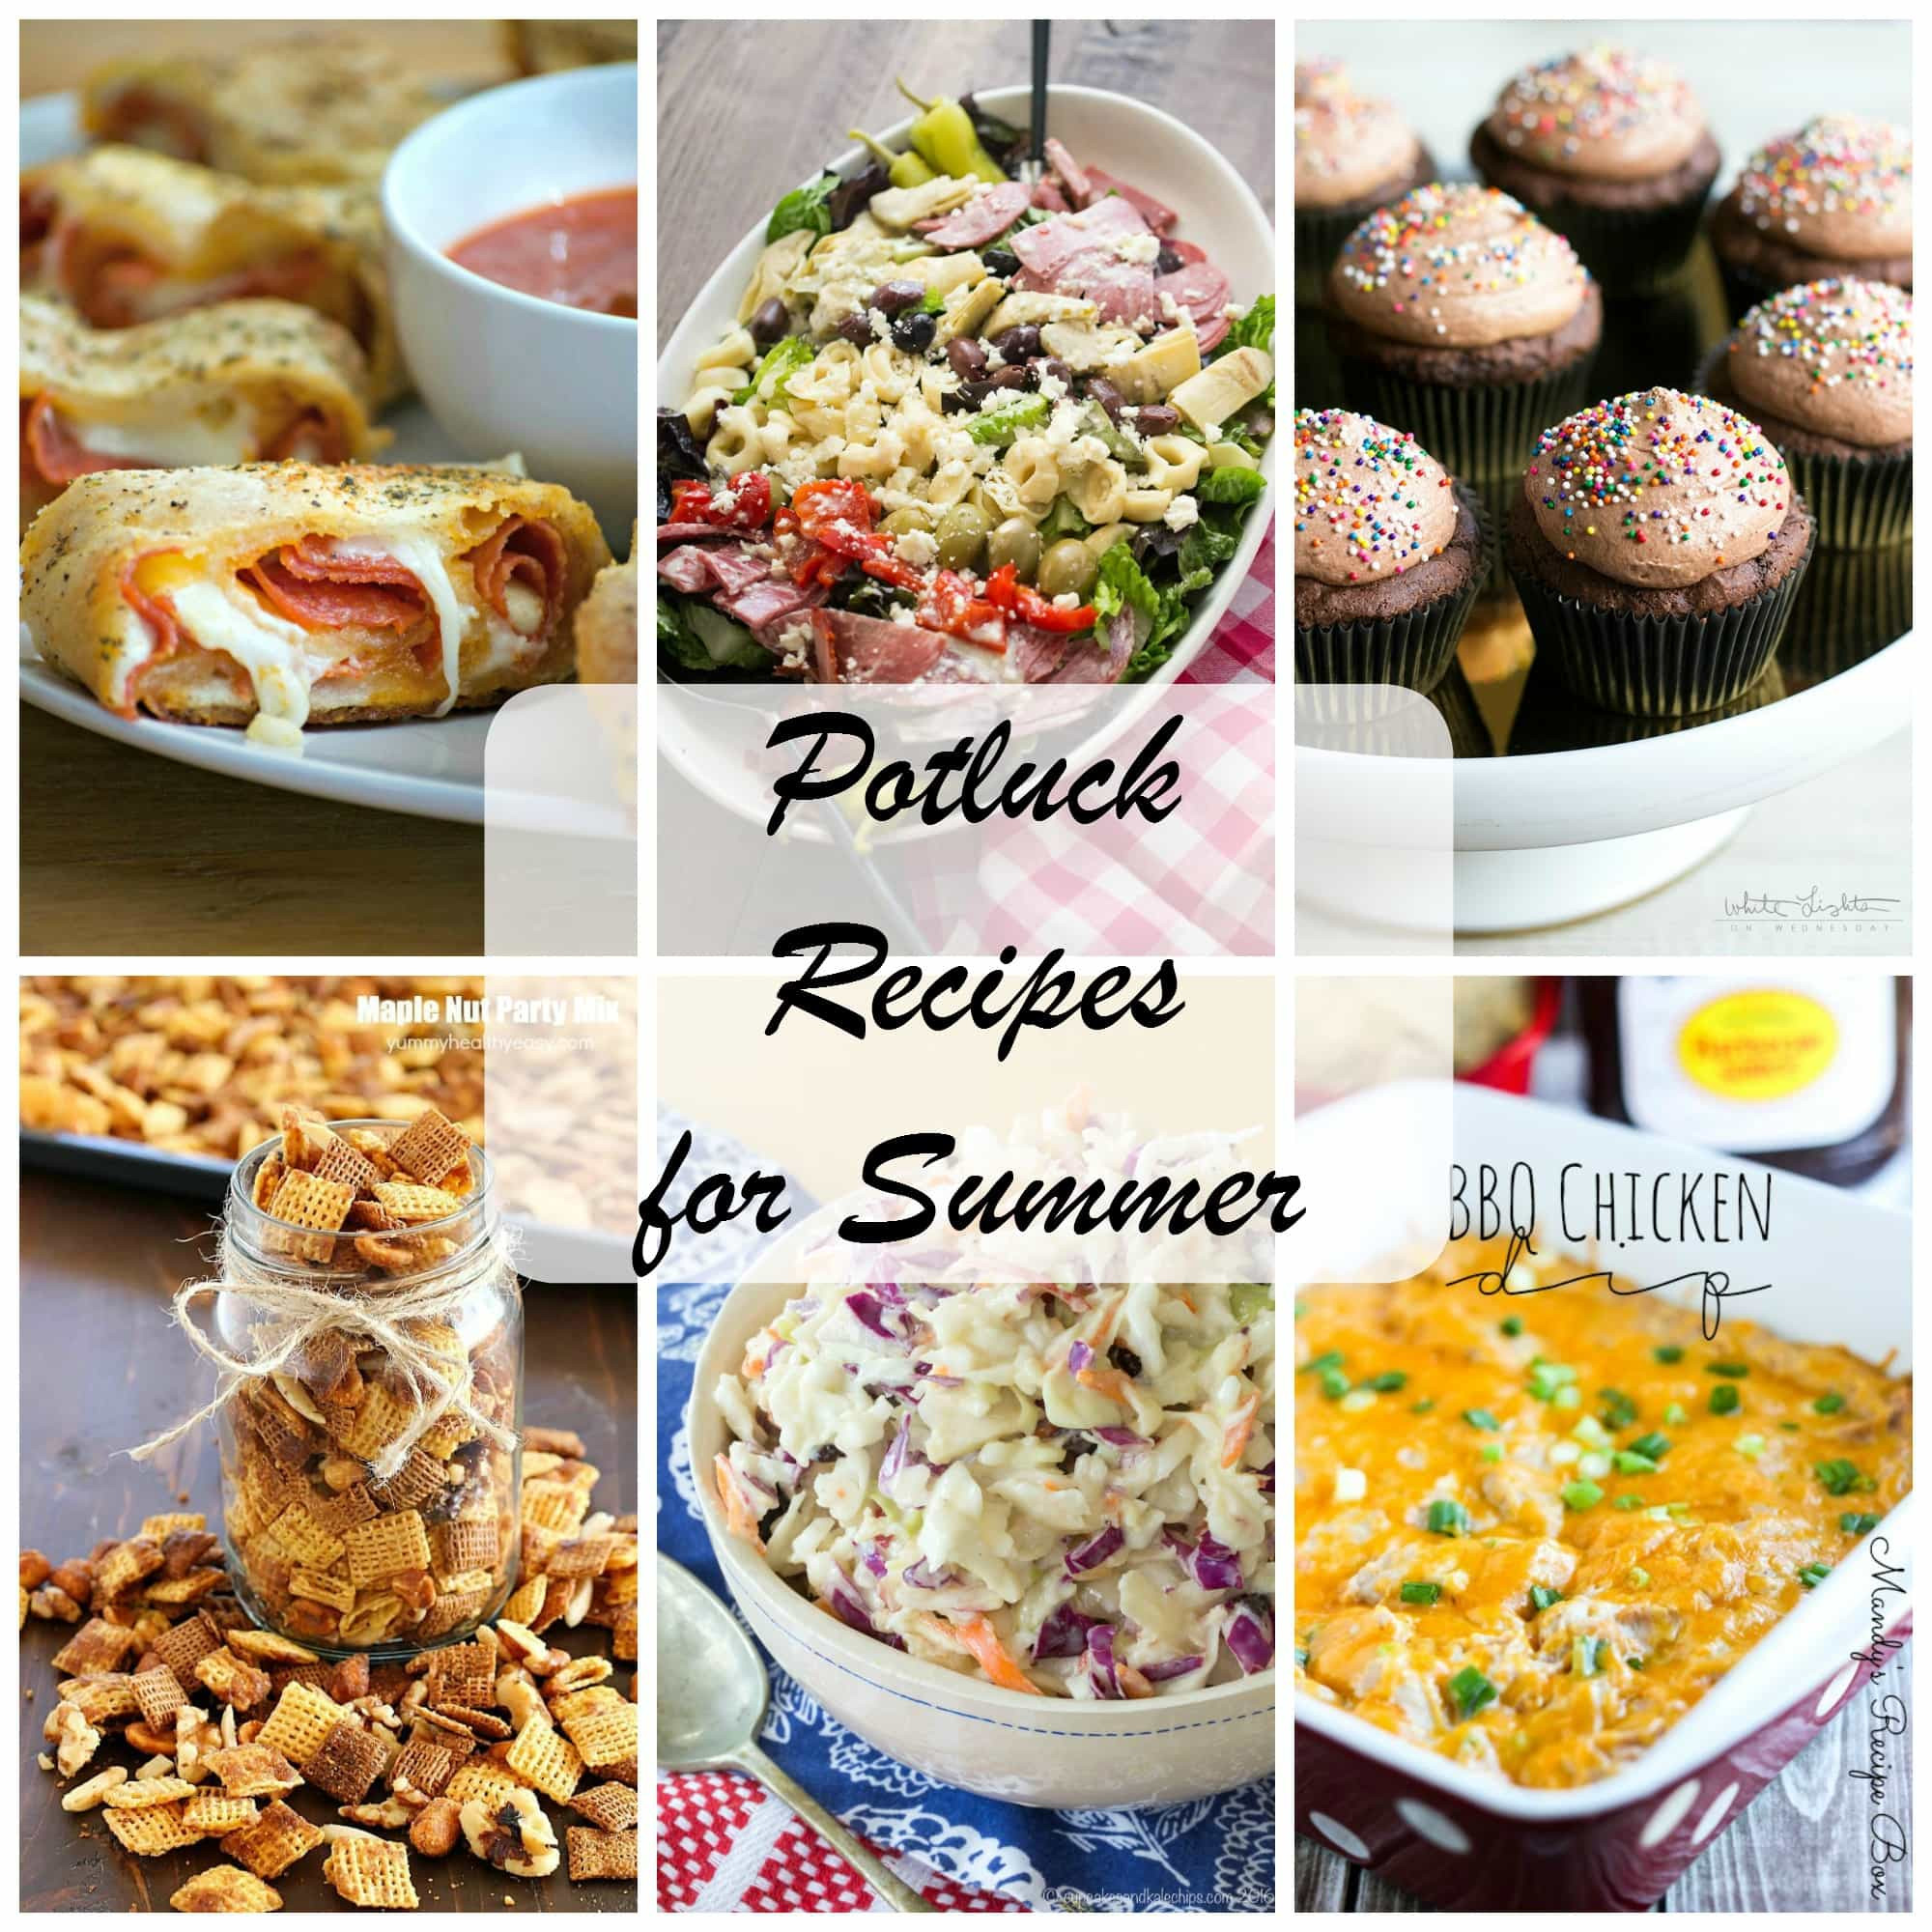 Summer Potluck Desserts  Summer Potluck Recipes 365 Days of Baking and More